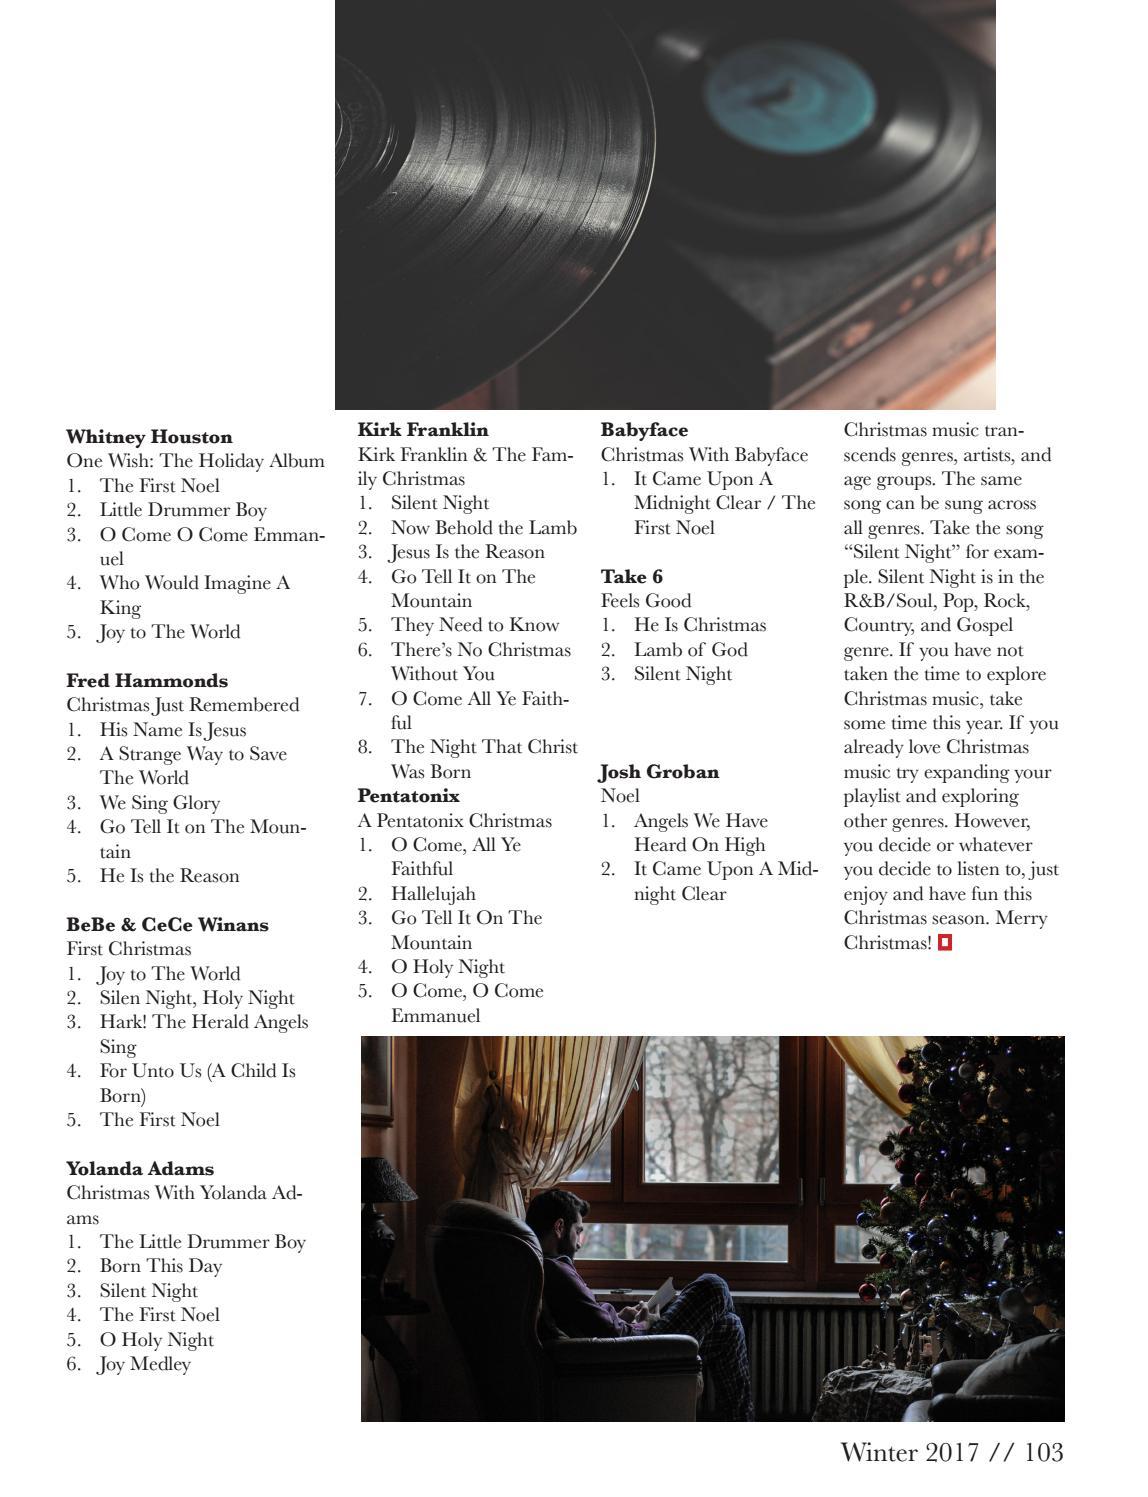 Winter 2017 by Deliberate Magazine - issuu